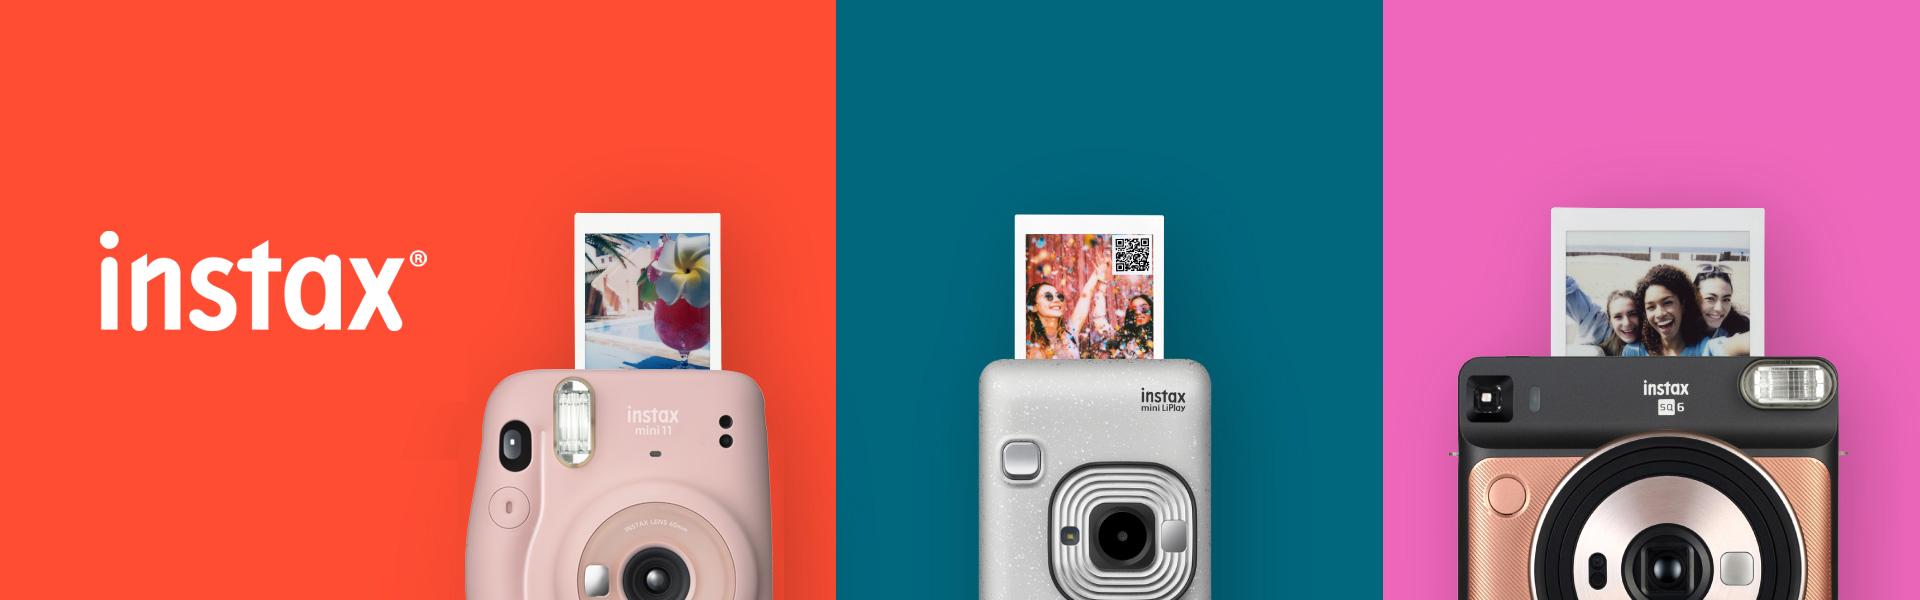 [photo] instax Cameras